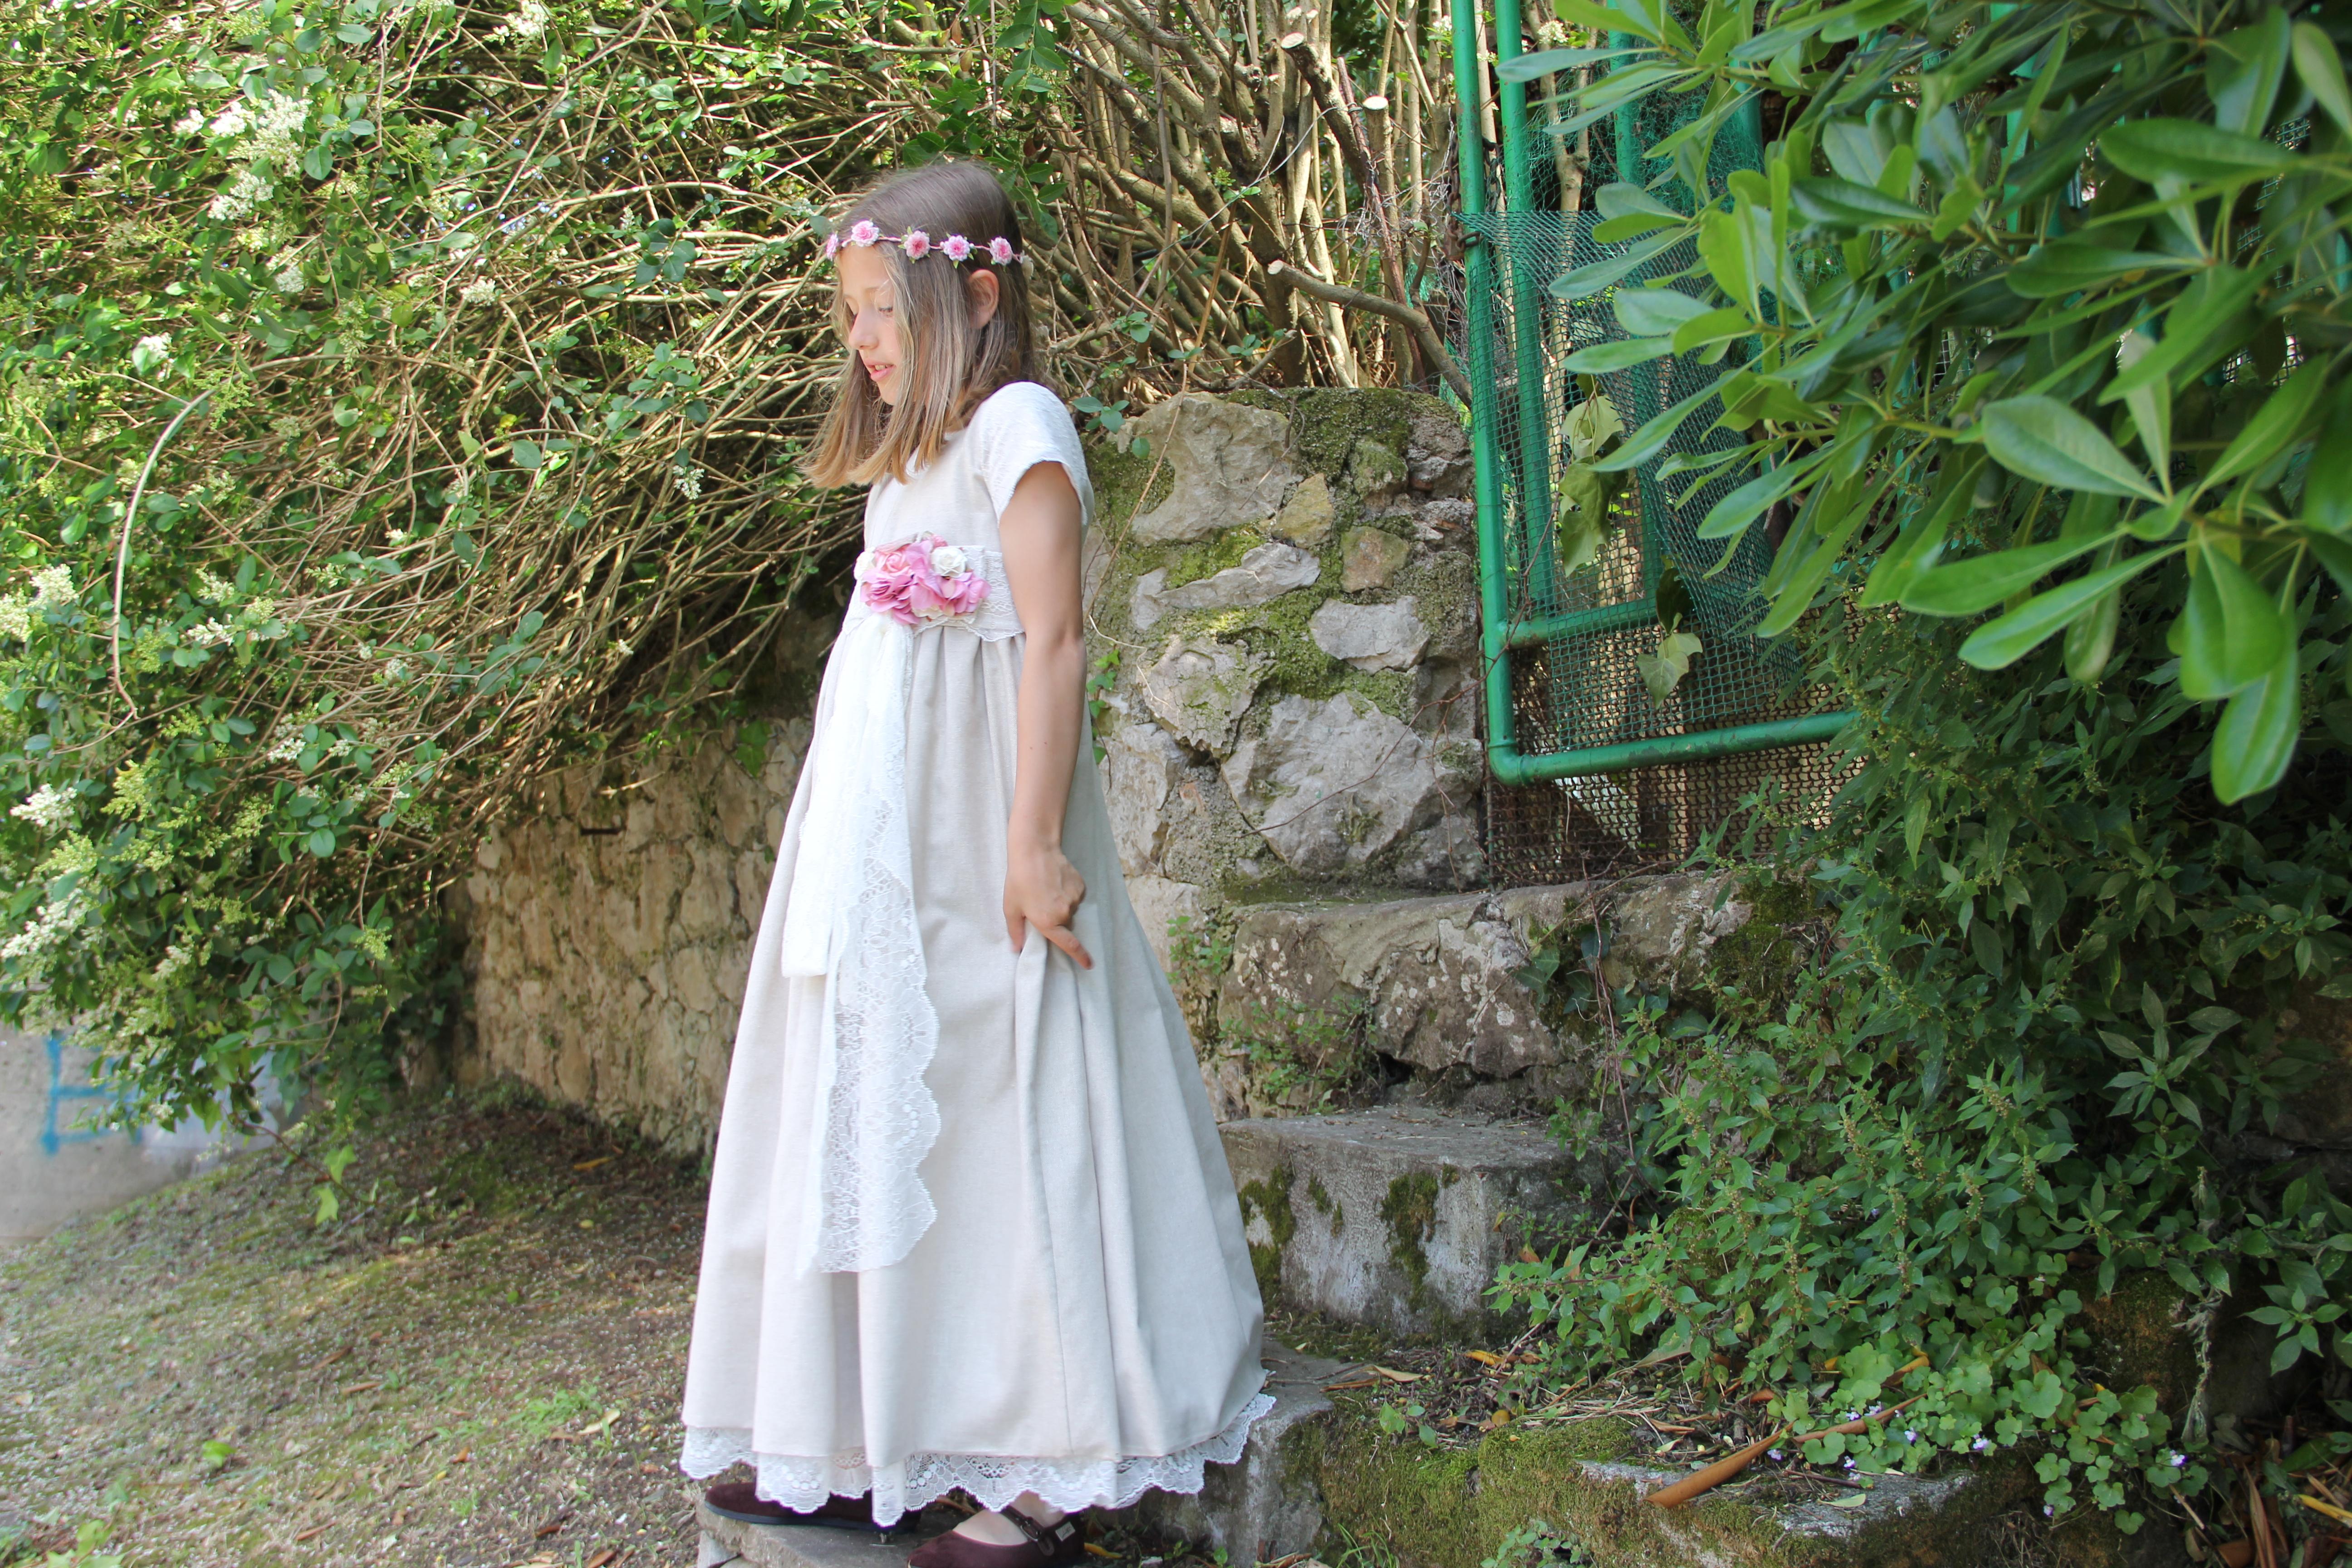 vestido-de-comunion-de-lino-vestido-de-comunion-beige-comuniones-2017-vestidos-de-comunion-a-medida-vestido-de-comunion-online-14